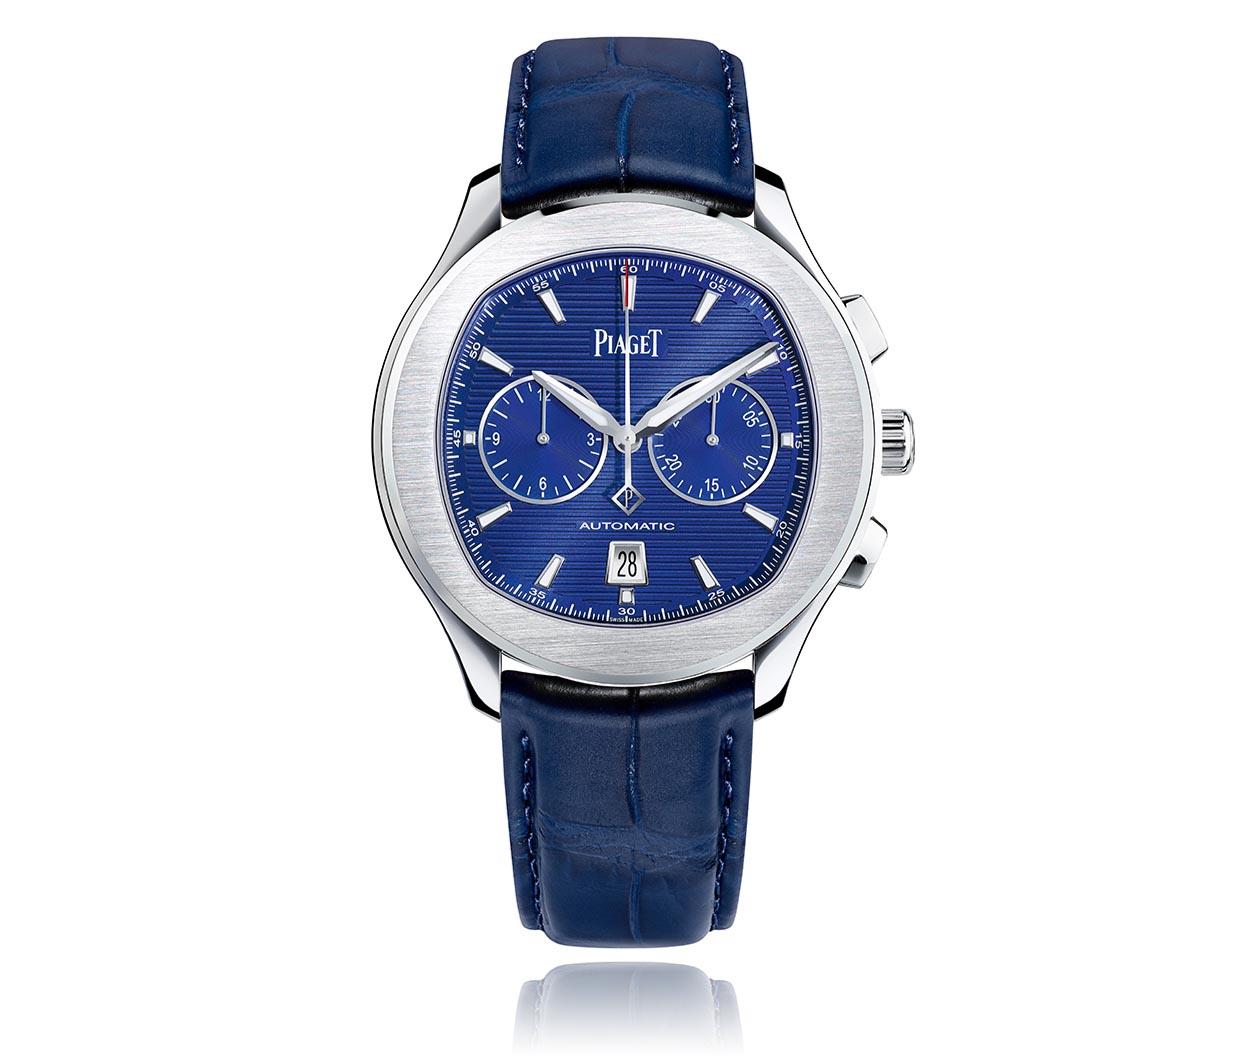 Piaget Polo watch G0A43002 Carousel 1 FINAL